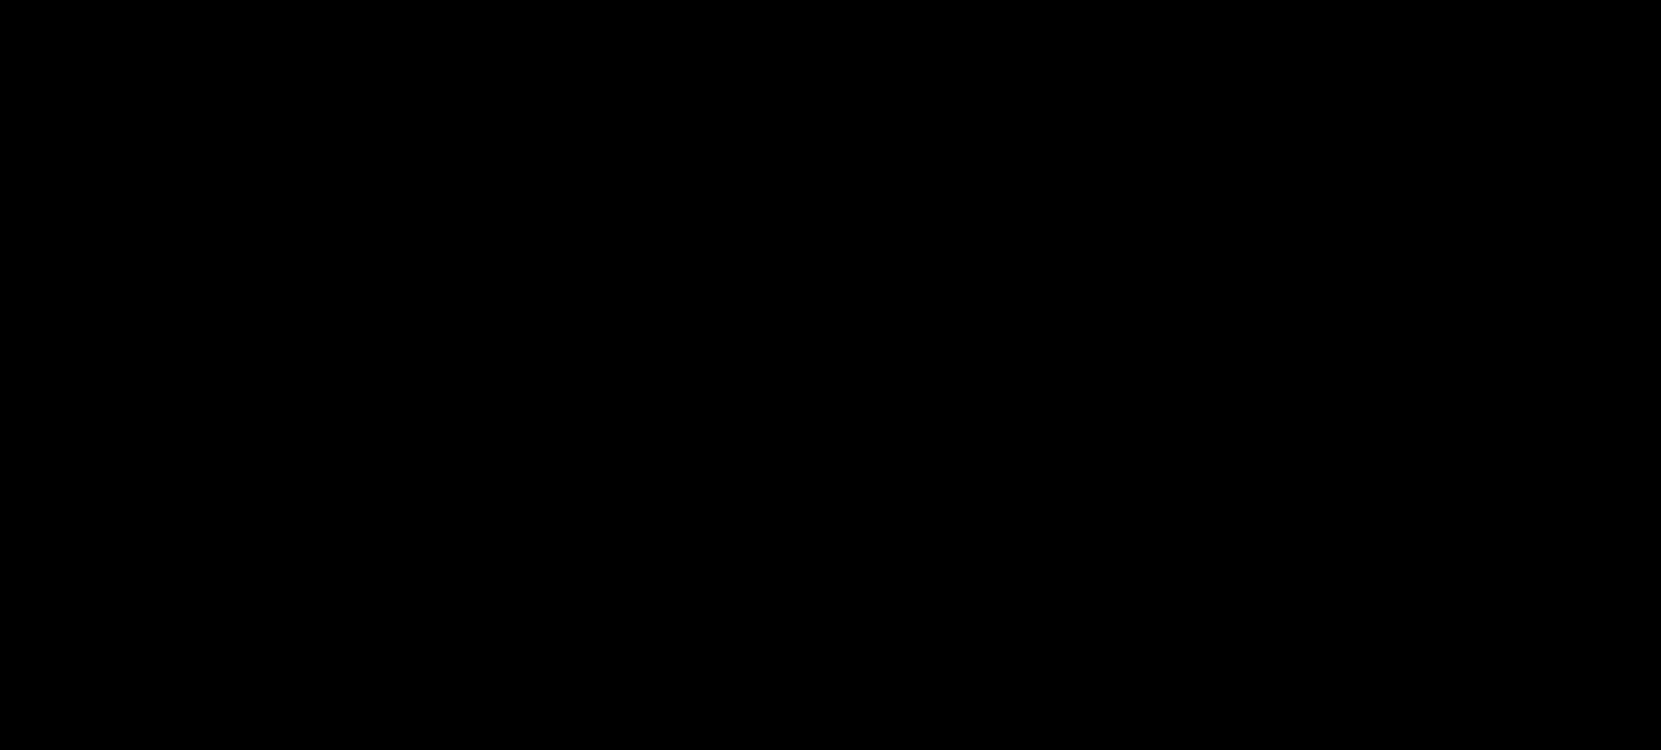 Monochrome Photography,Text,Symbol